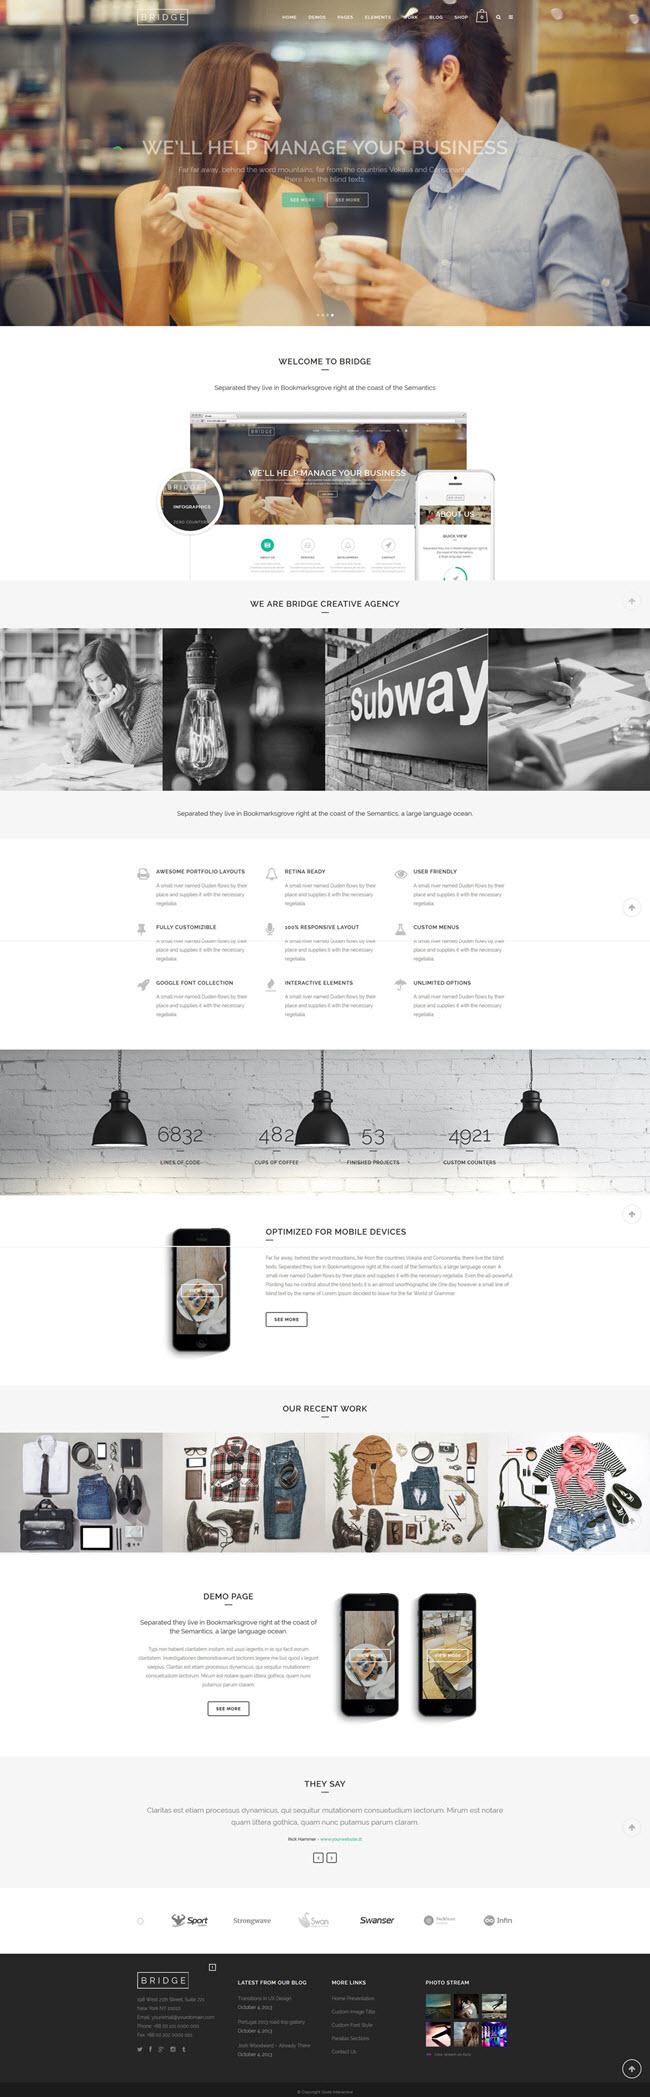 bridge screenshot Best Business WordPress Themes for June